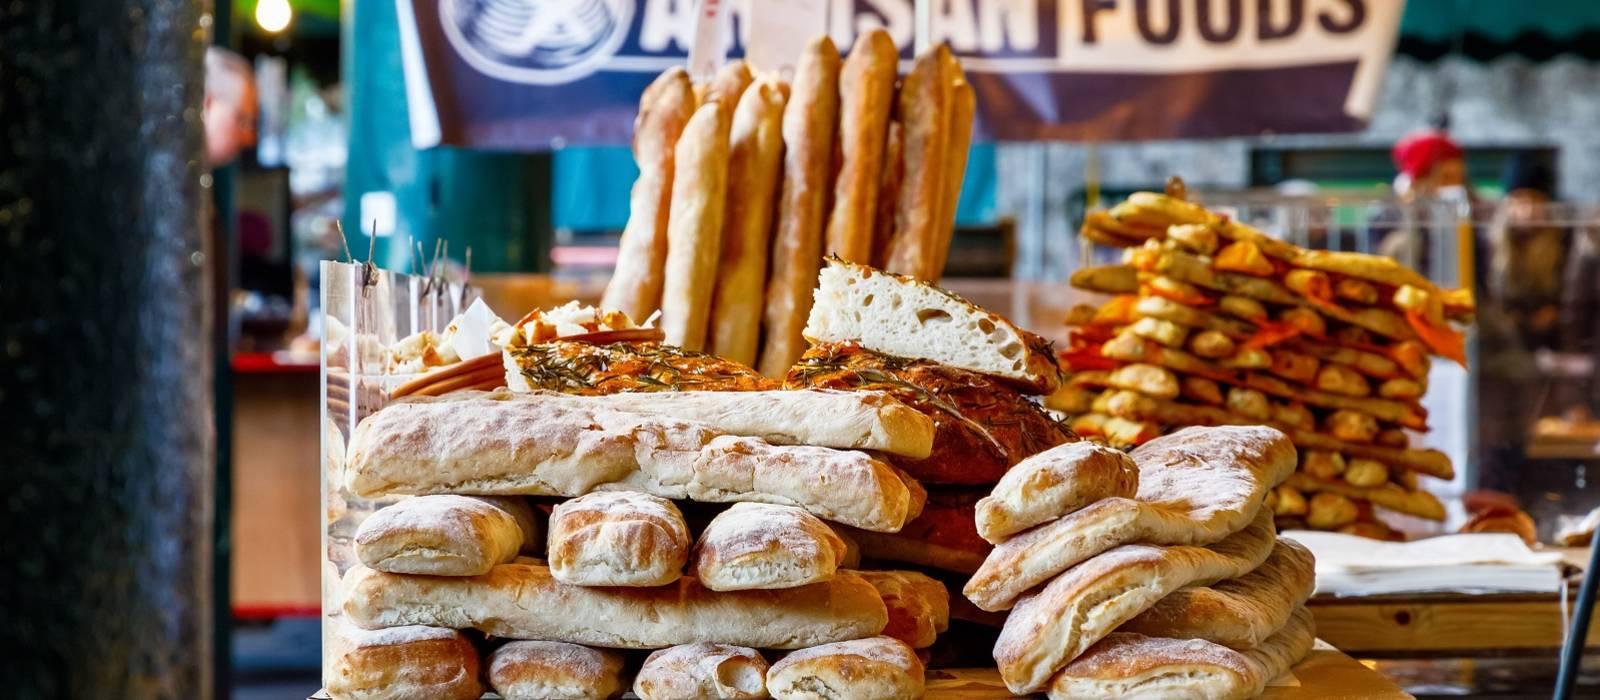 Cuisine in UK & Ireland - artisanal food